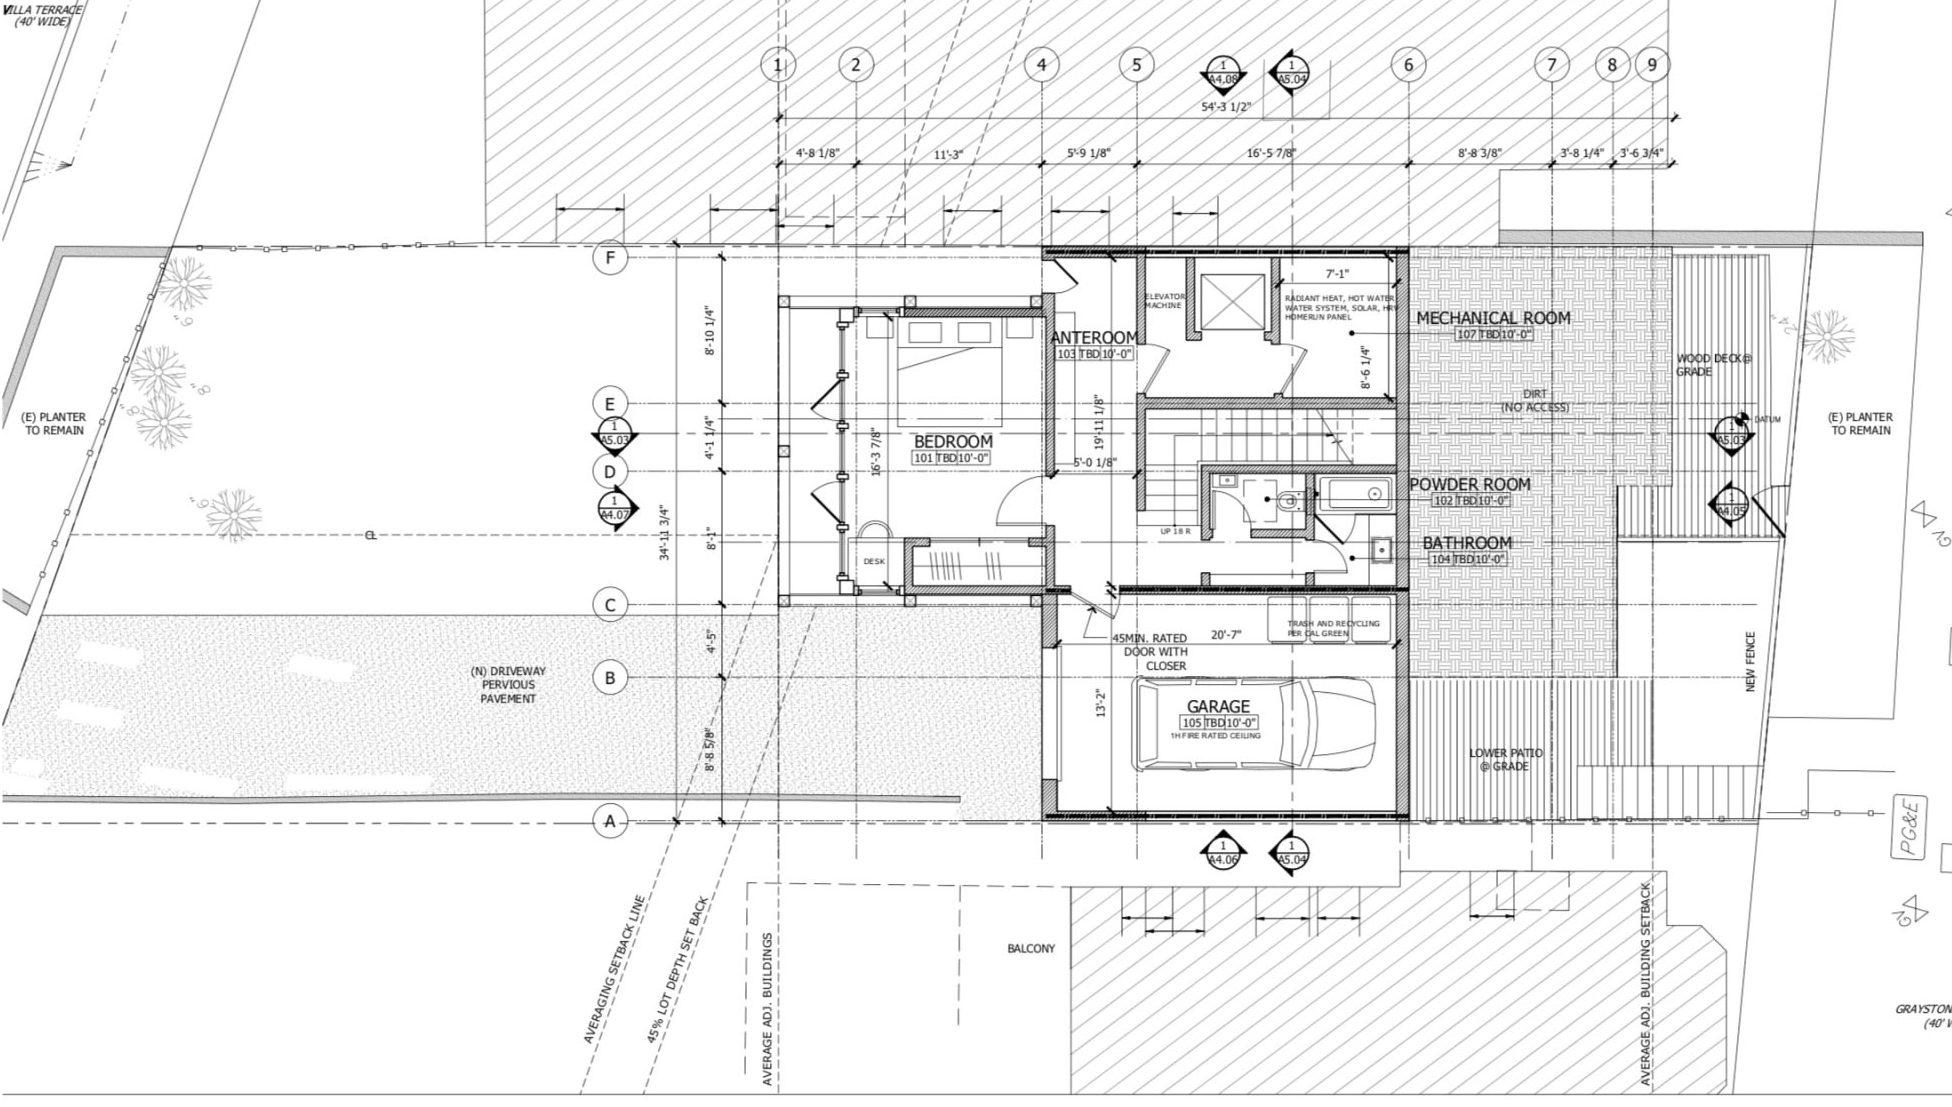 135 Graystone Terrace First Floor Plan